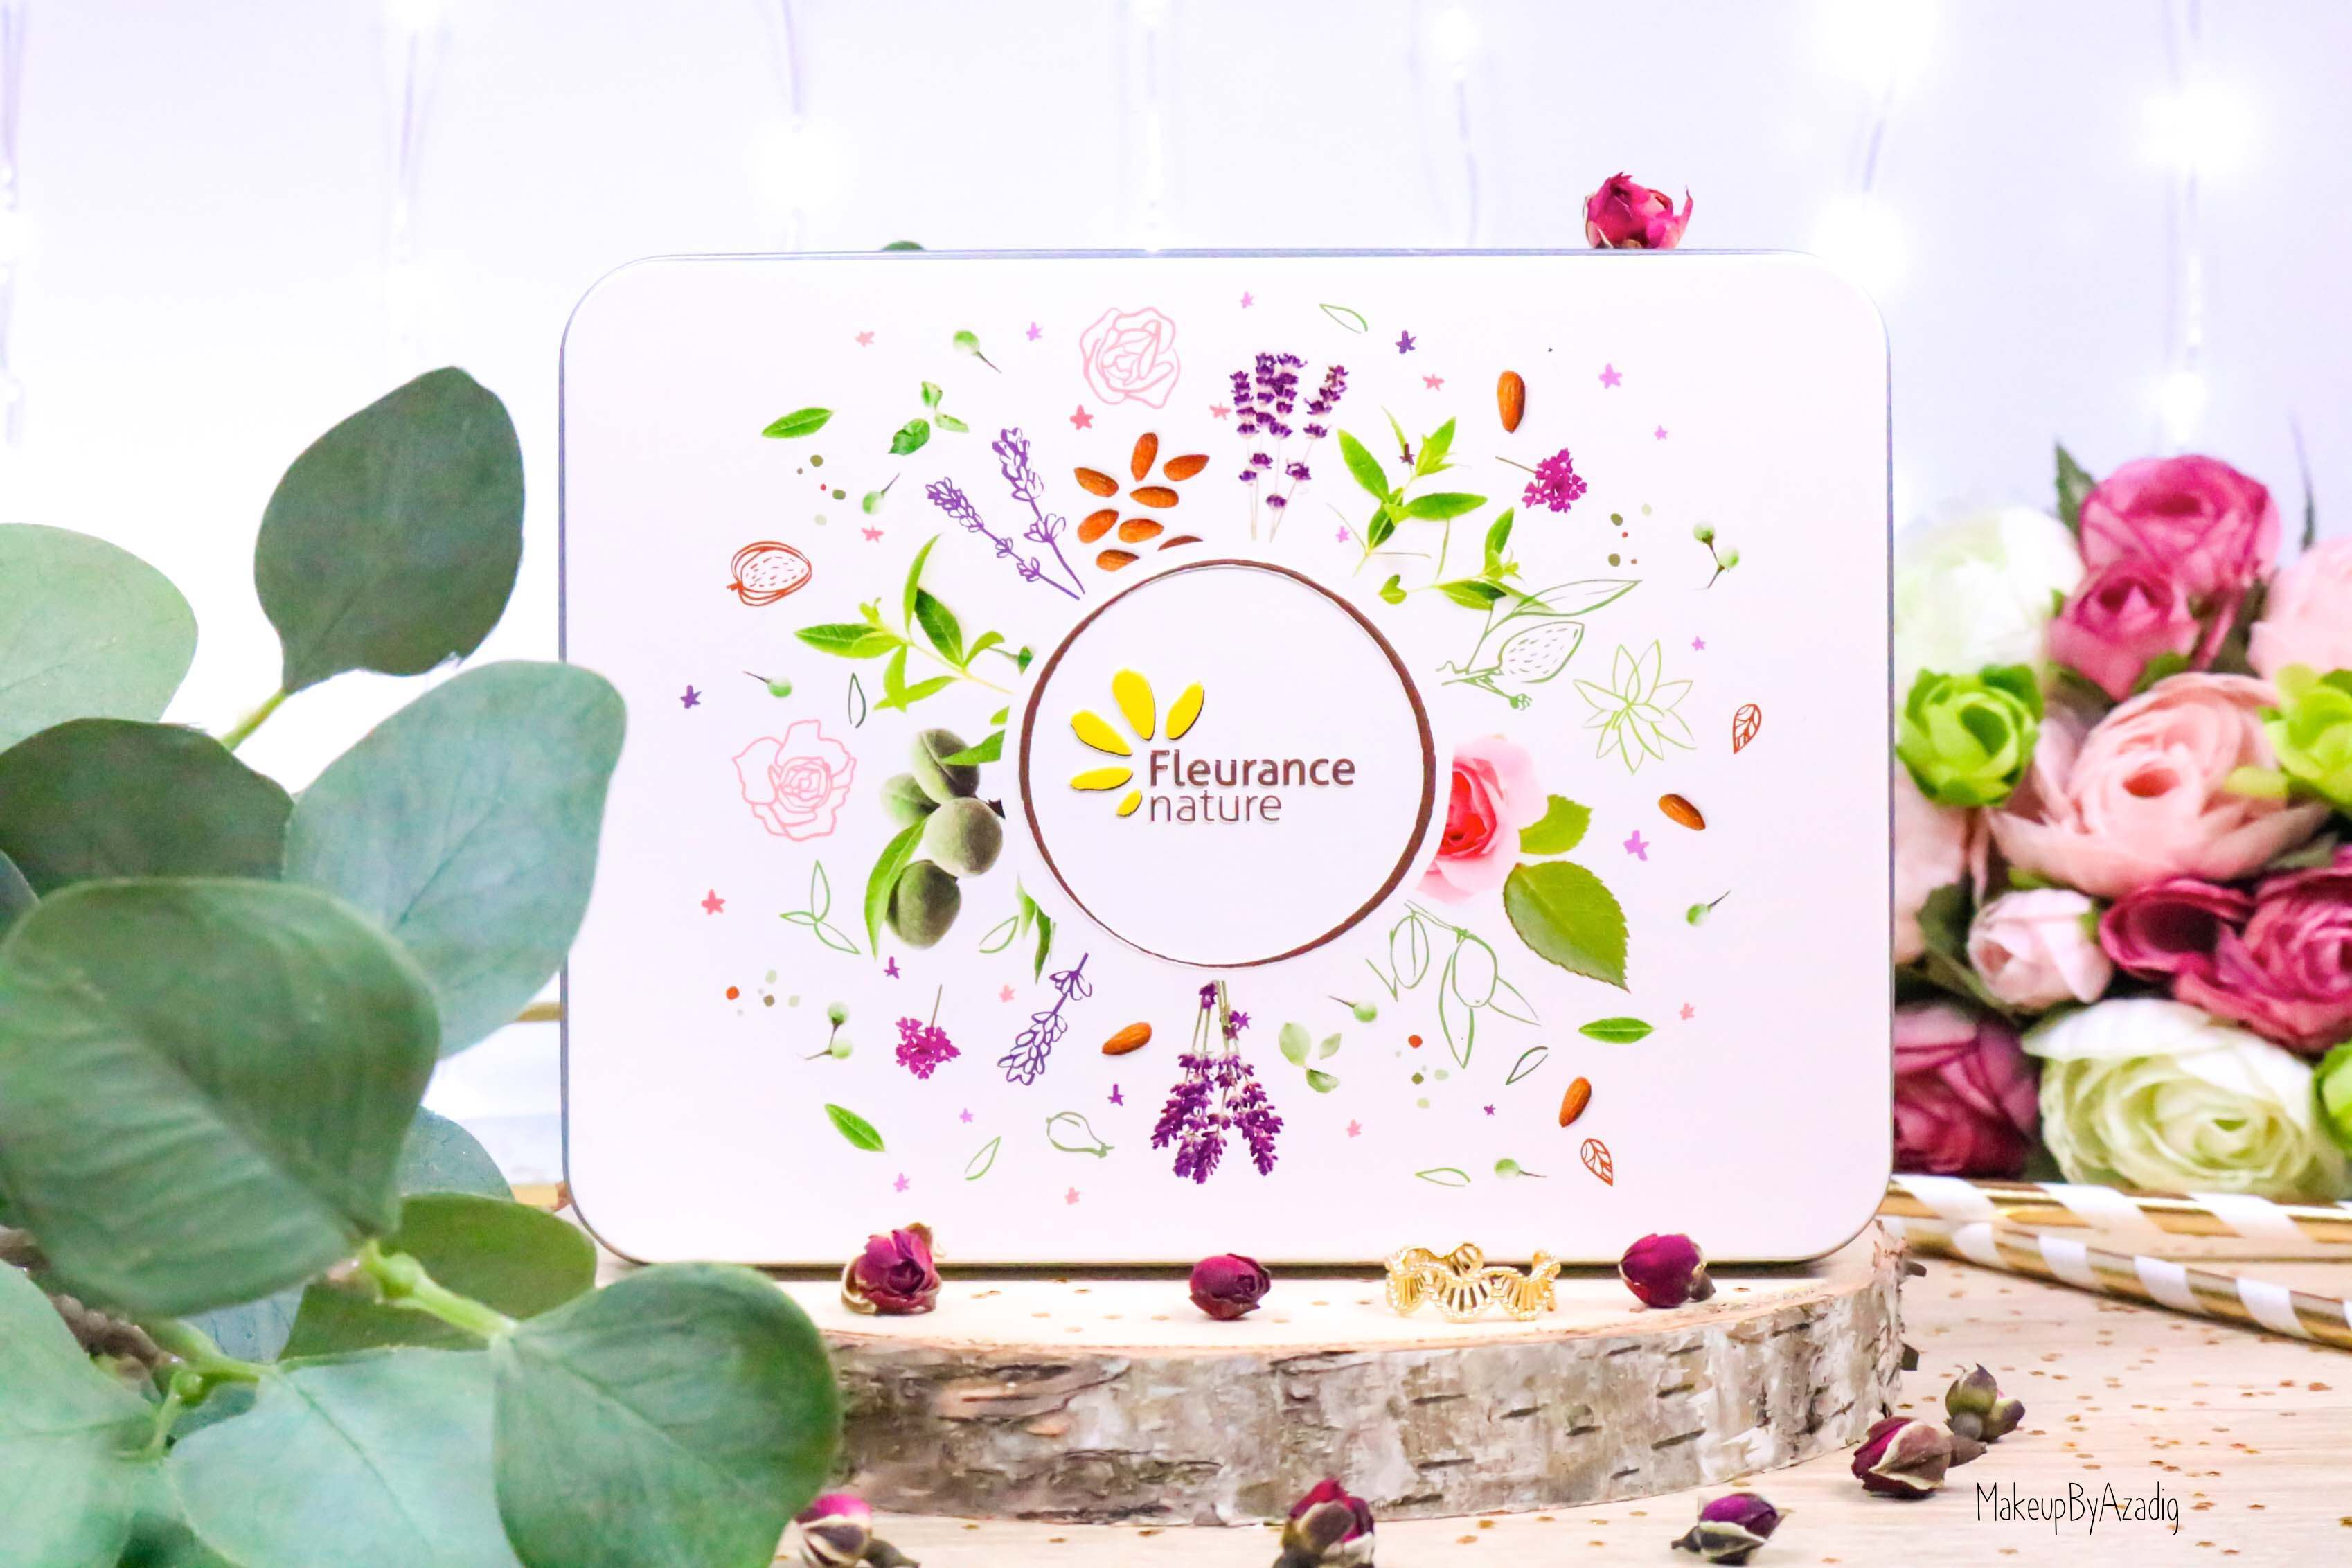 revue-creme-hydratante-reparatrice-mains-hand-bio-beaute-fleurance-nature-makeupbyazadig-verveine-lavande-rose-amande-packaging